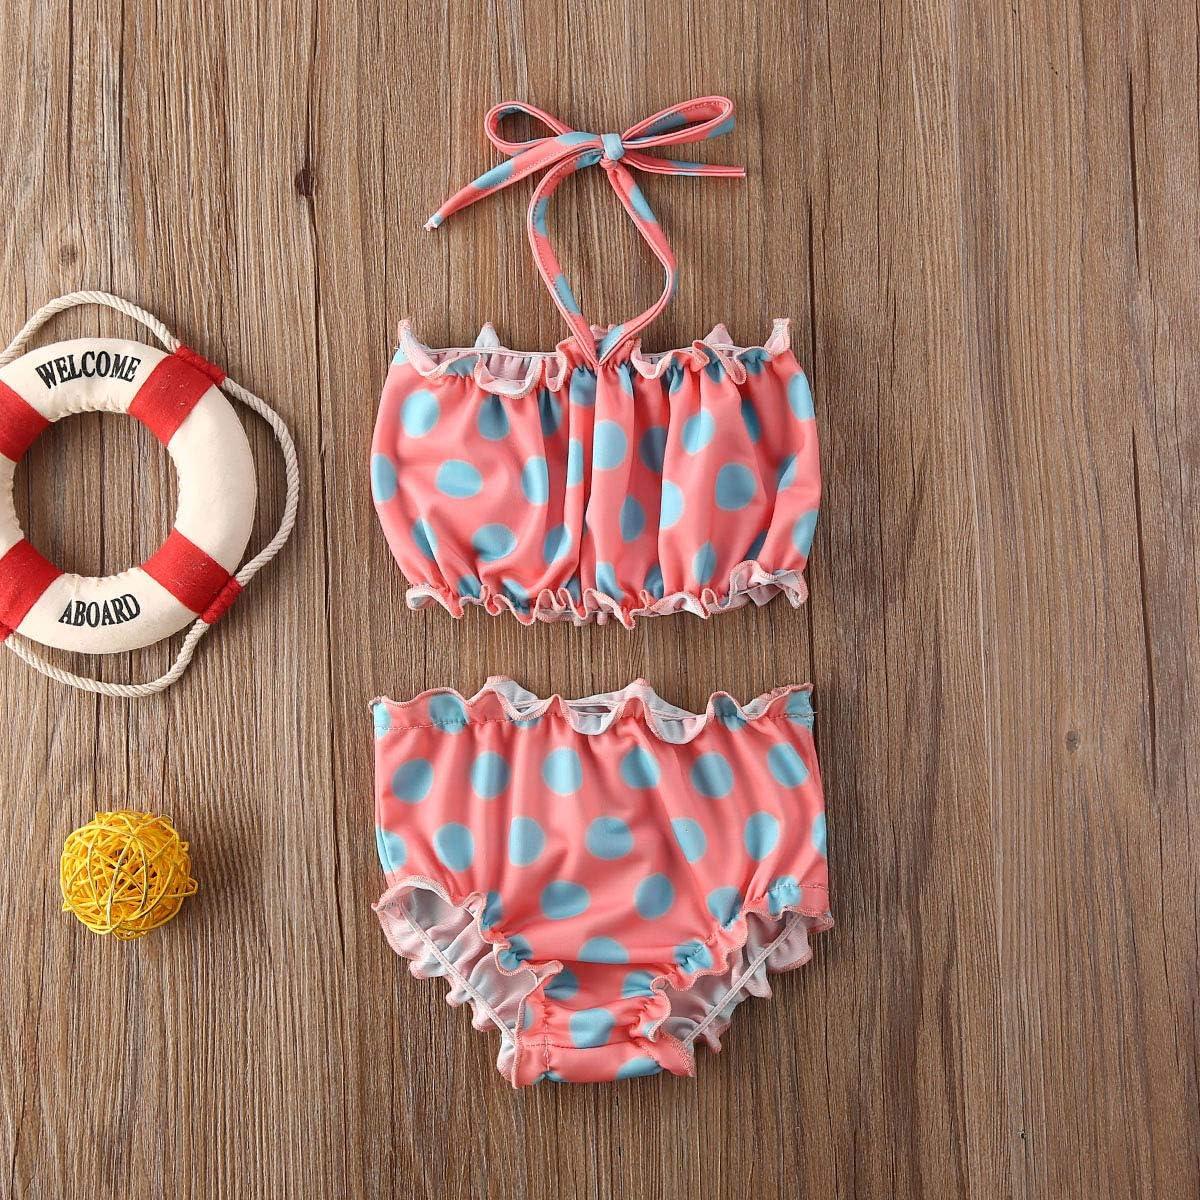 1-5Y Toddler Kids Baby Girl Swimsuit Polka Dot Halter Bikini Top Bottoms 2 Pieces Bathing Suit Beachwear